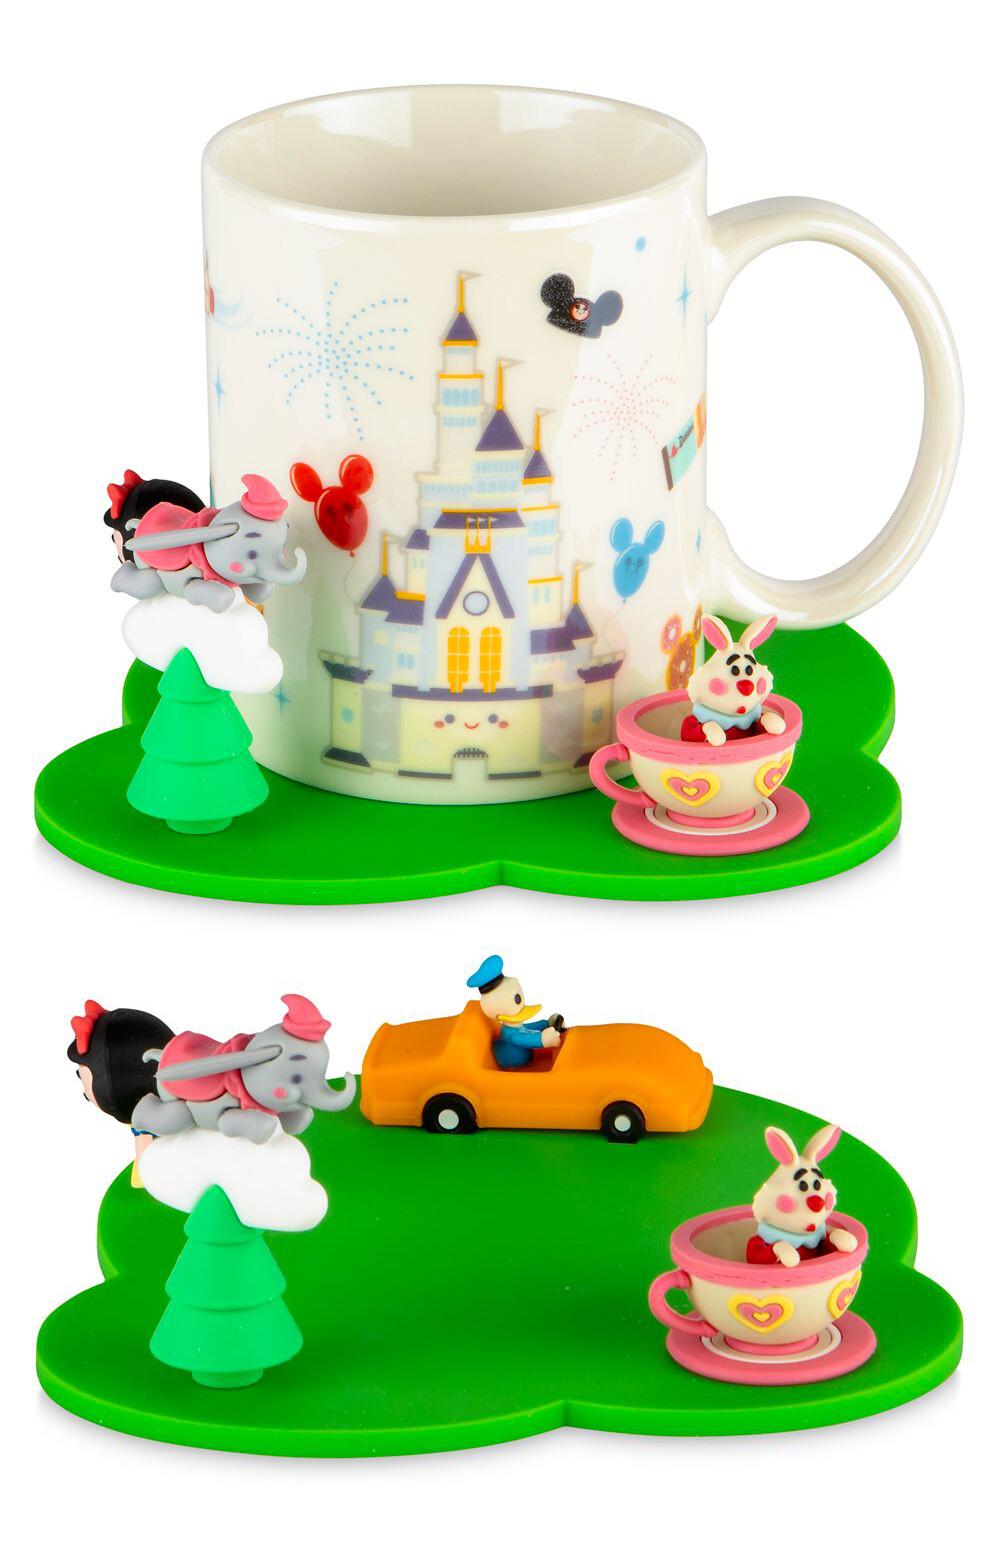 Mug & Coaster Set - Actual Product Image